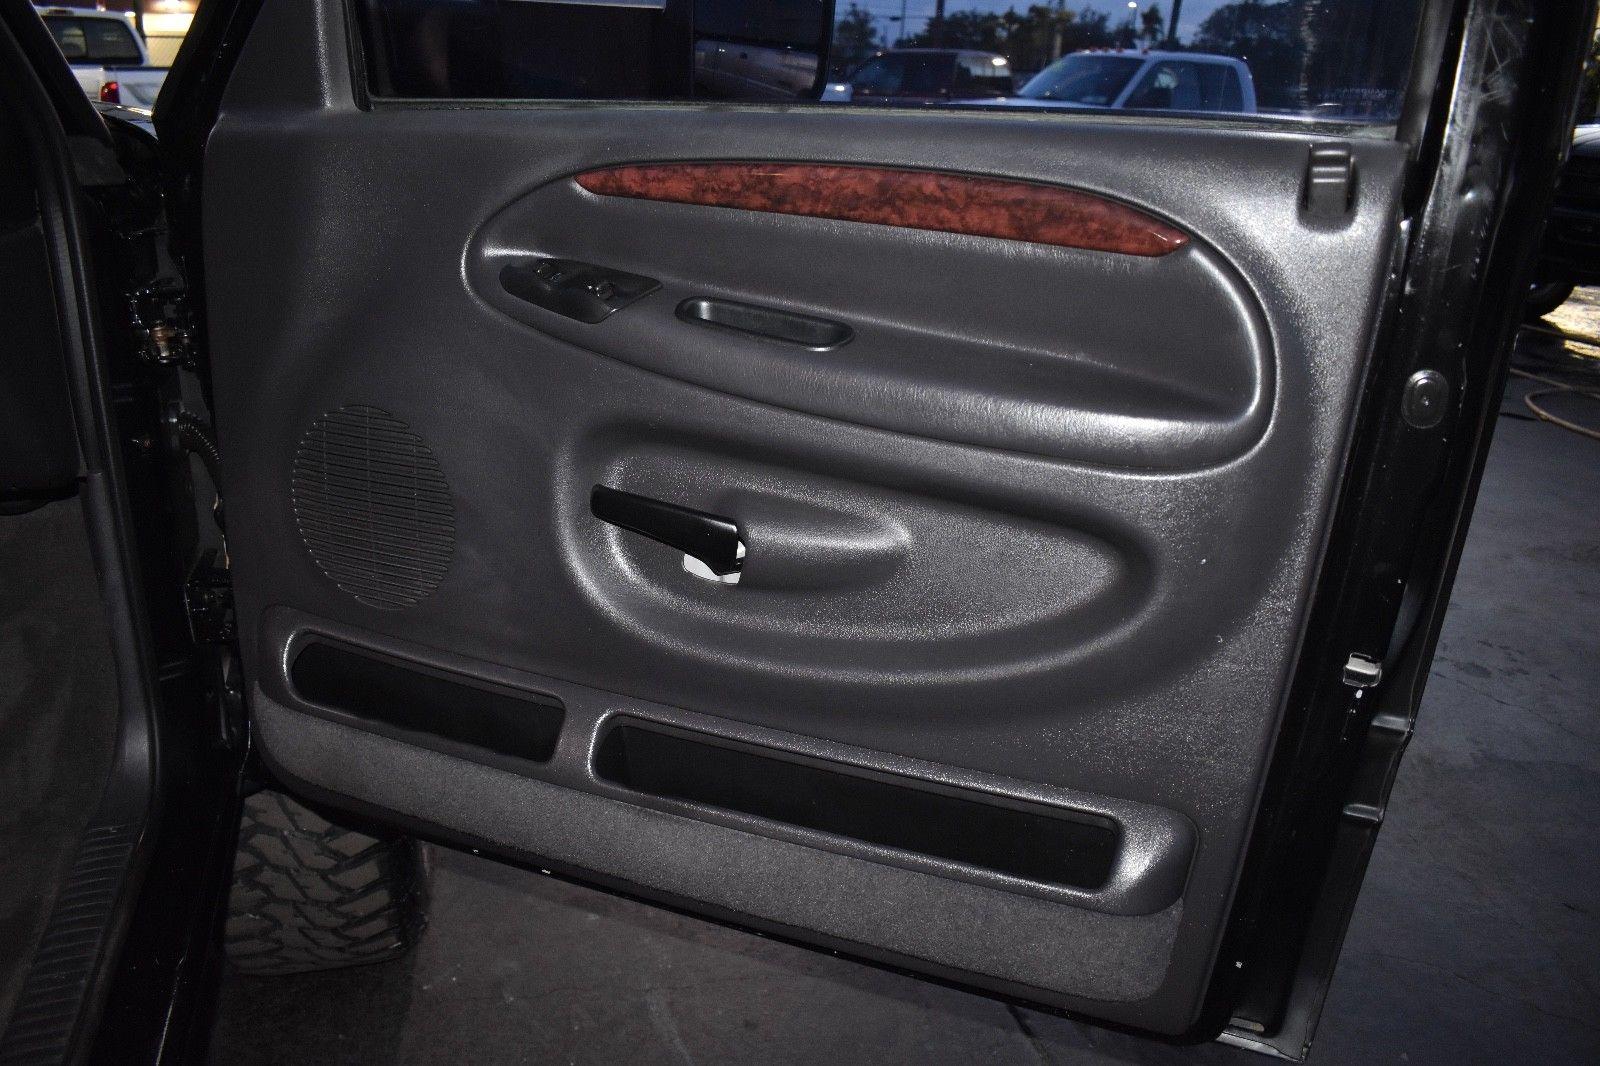 2016 Hyundai Elantra Value Edition >> Used 2001 Dodge Ram 2500 SPORT 2001 DODGE RAM 2500 SPORT ...